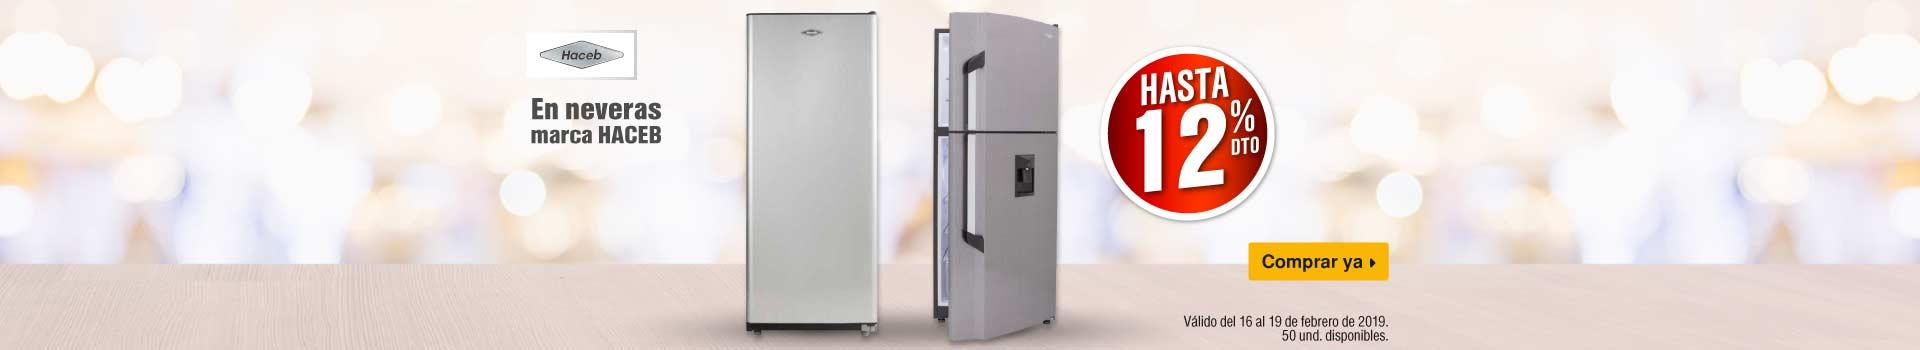 AK-KT-mayores-2-ELECT-BCAT-refrigeracion-150219